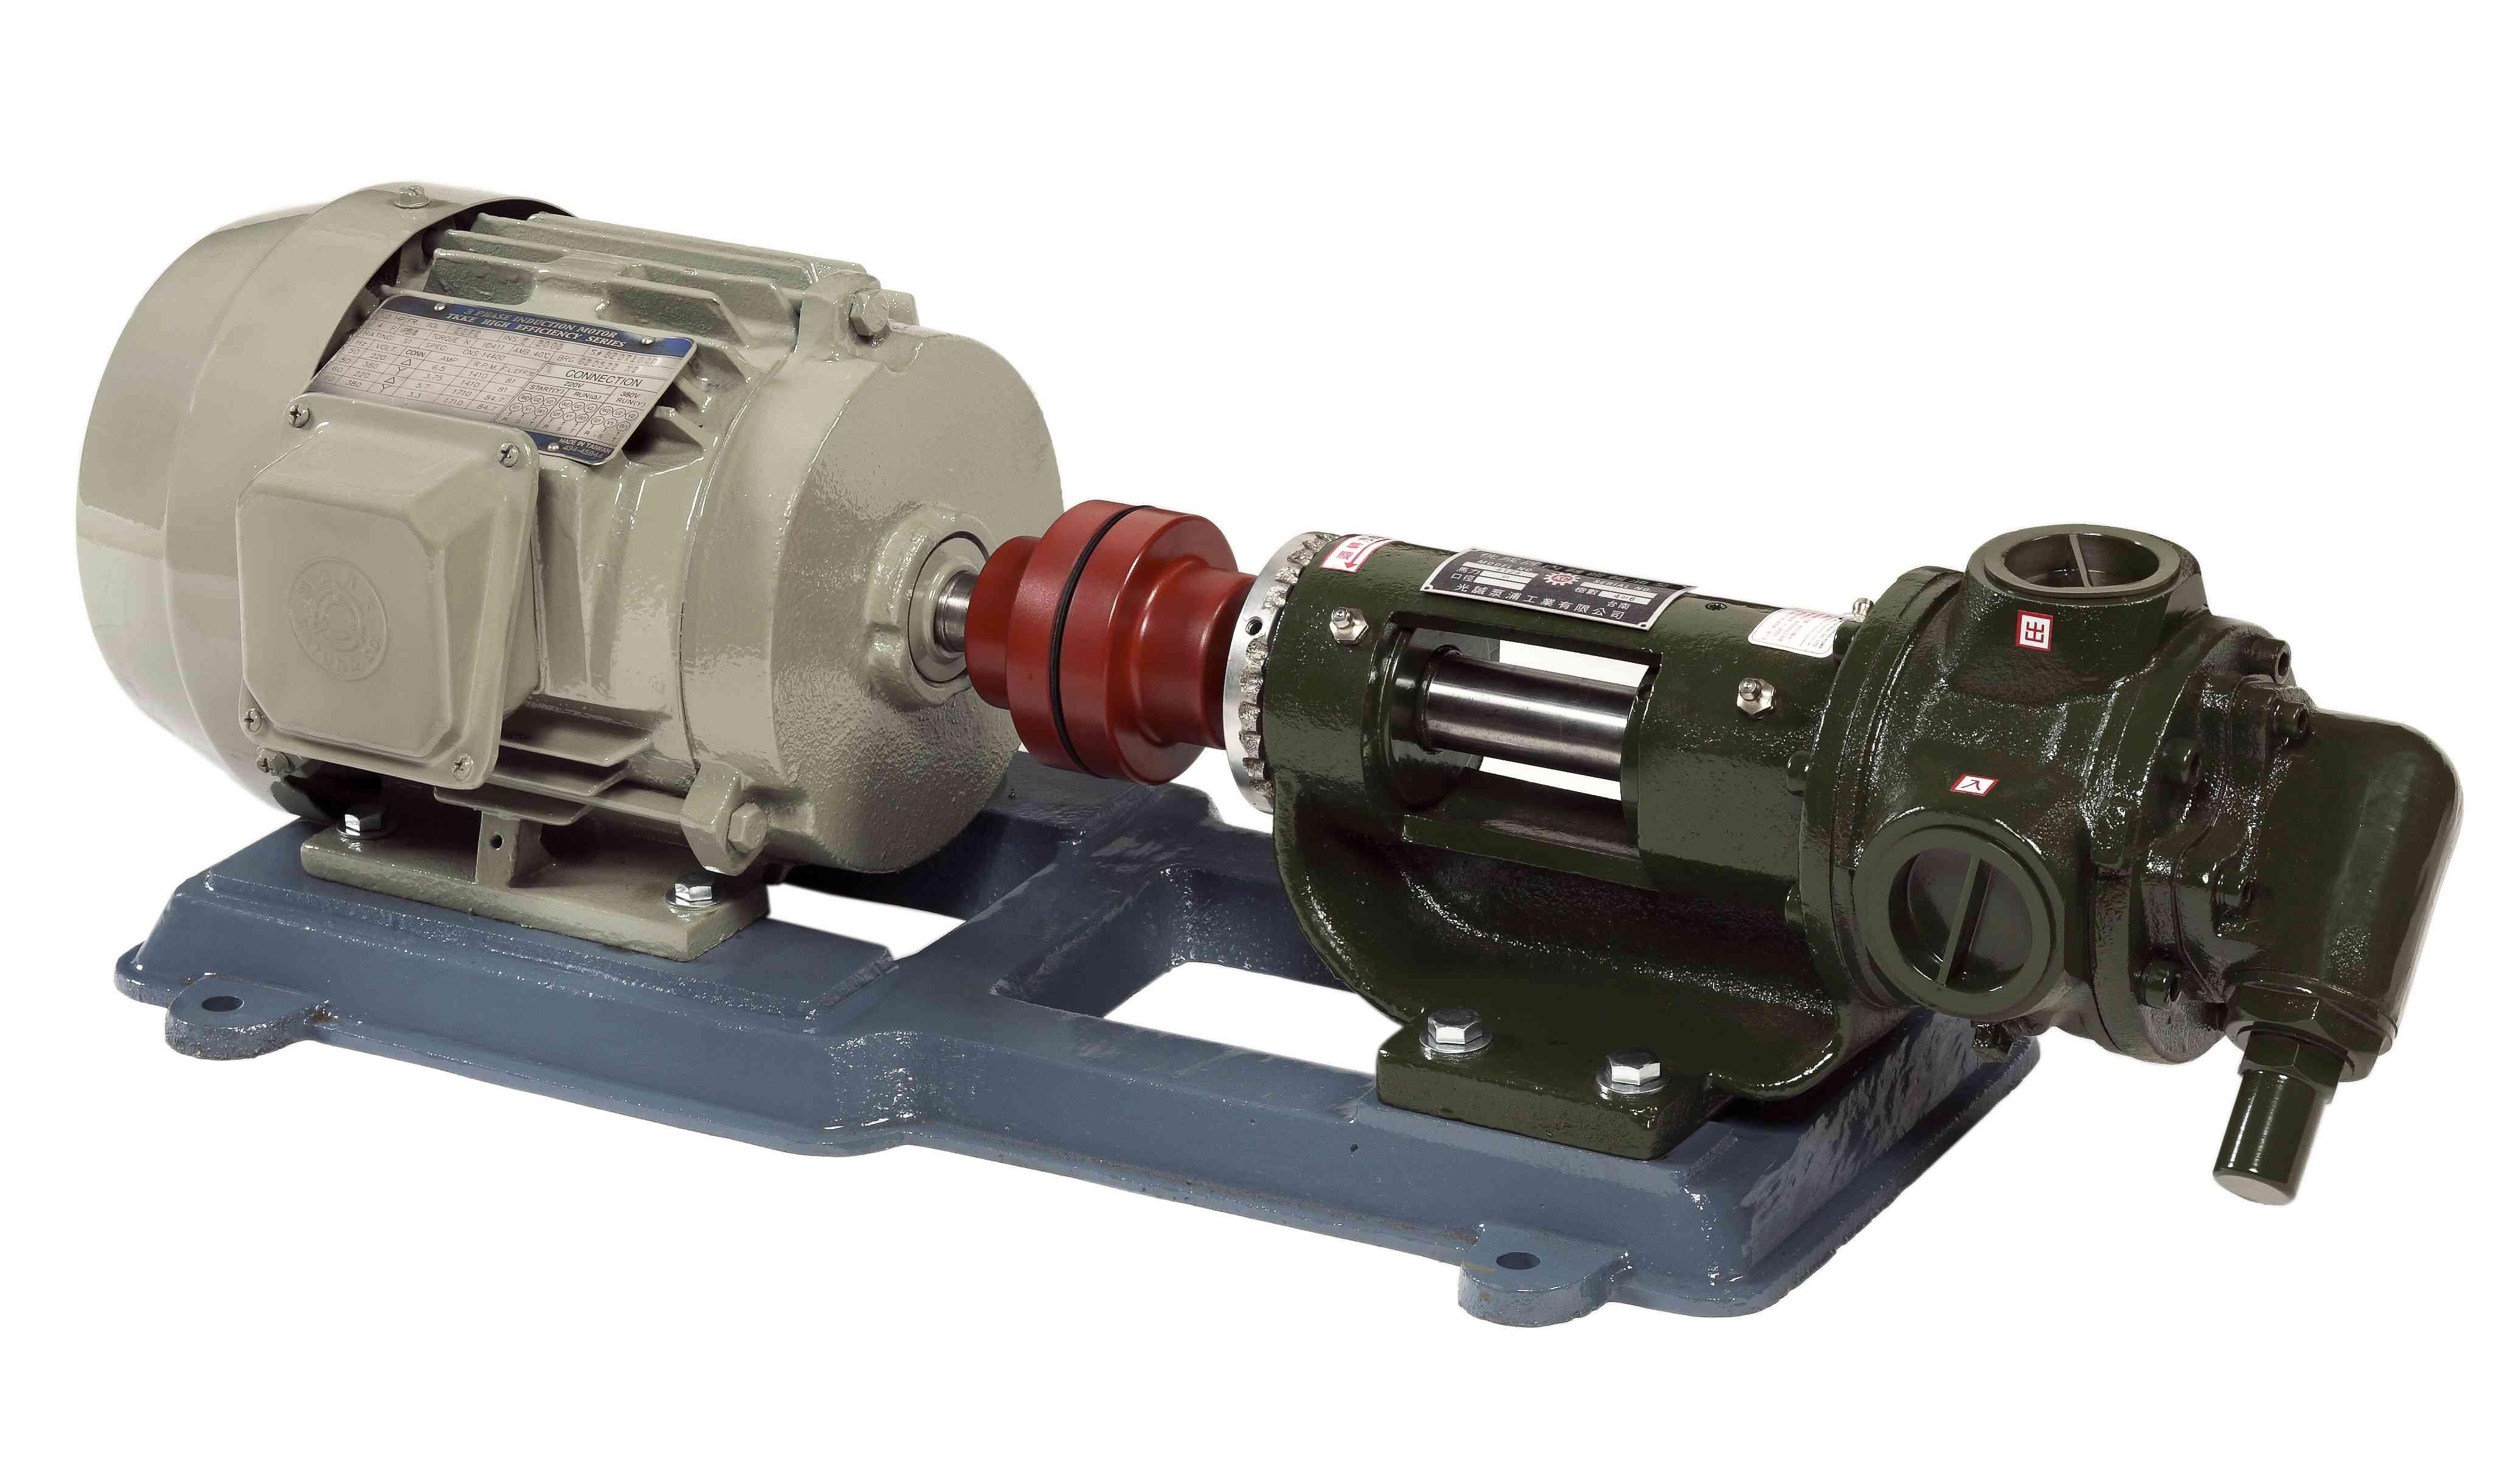 Máy bơm dầu, bơm bánh răng Seemsan MSL-35